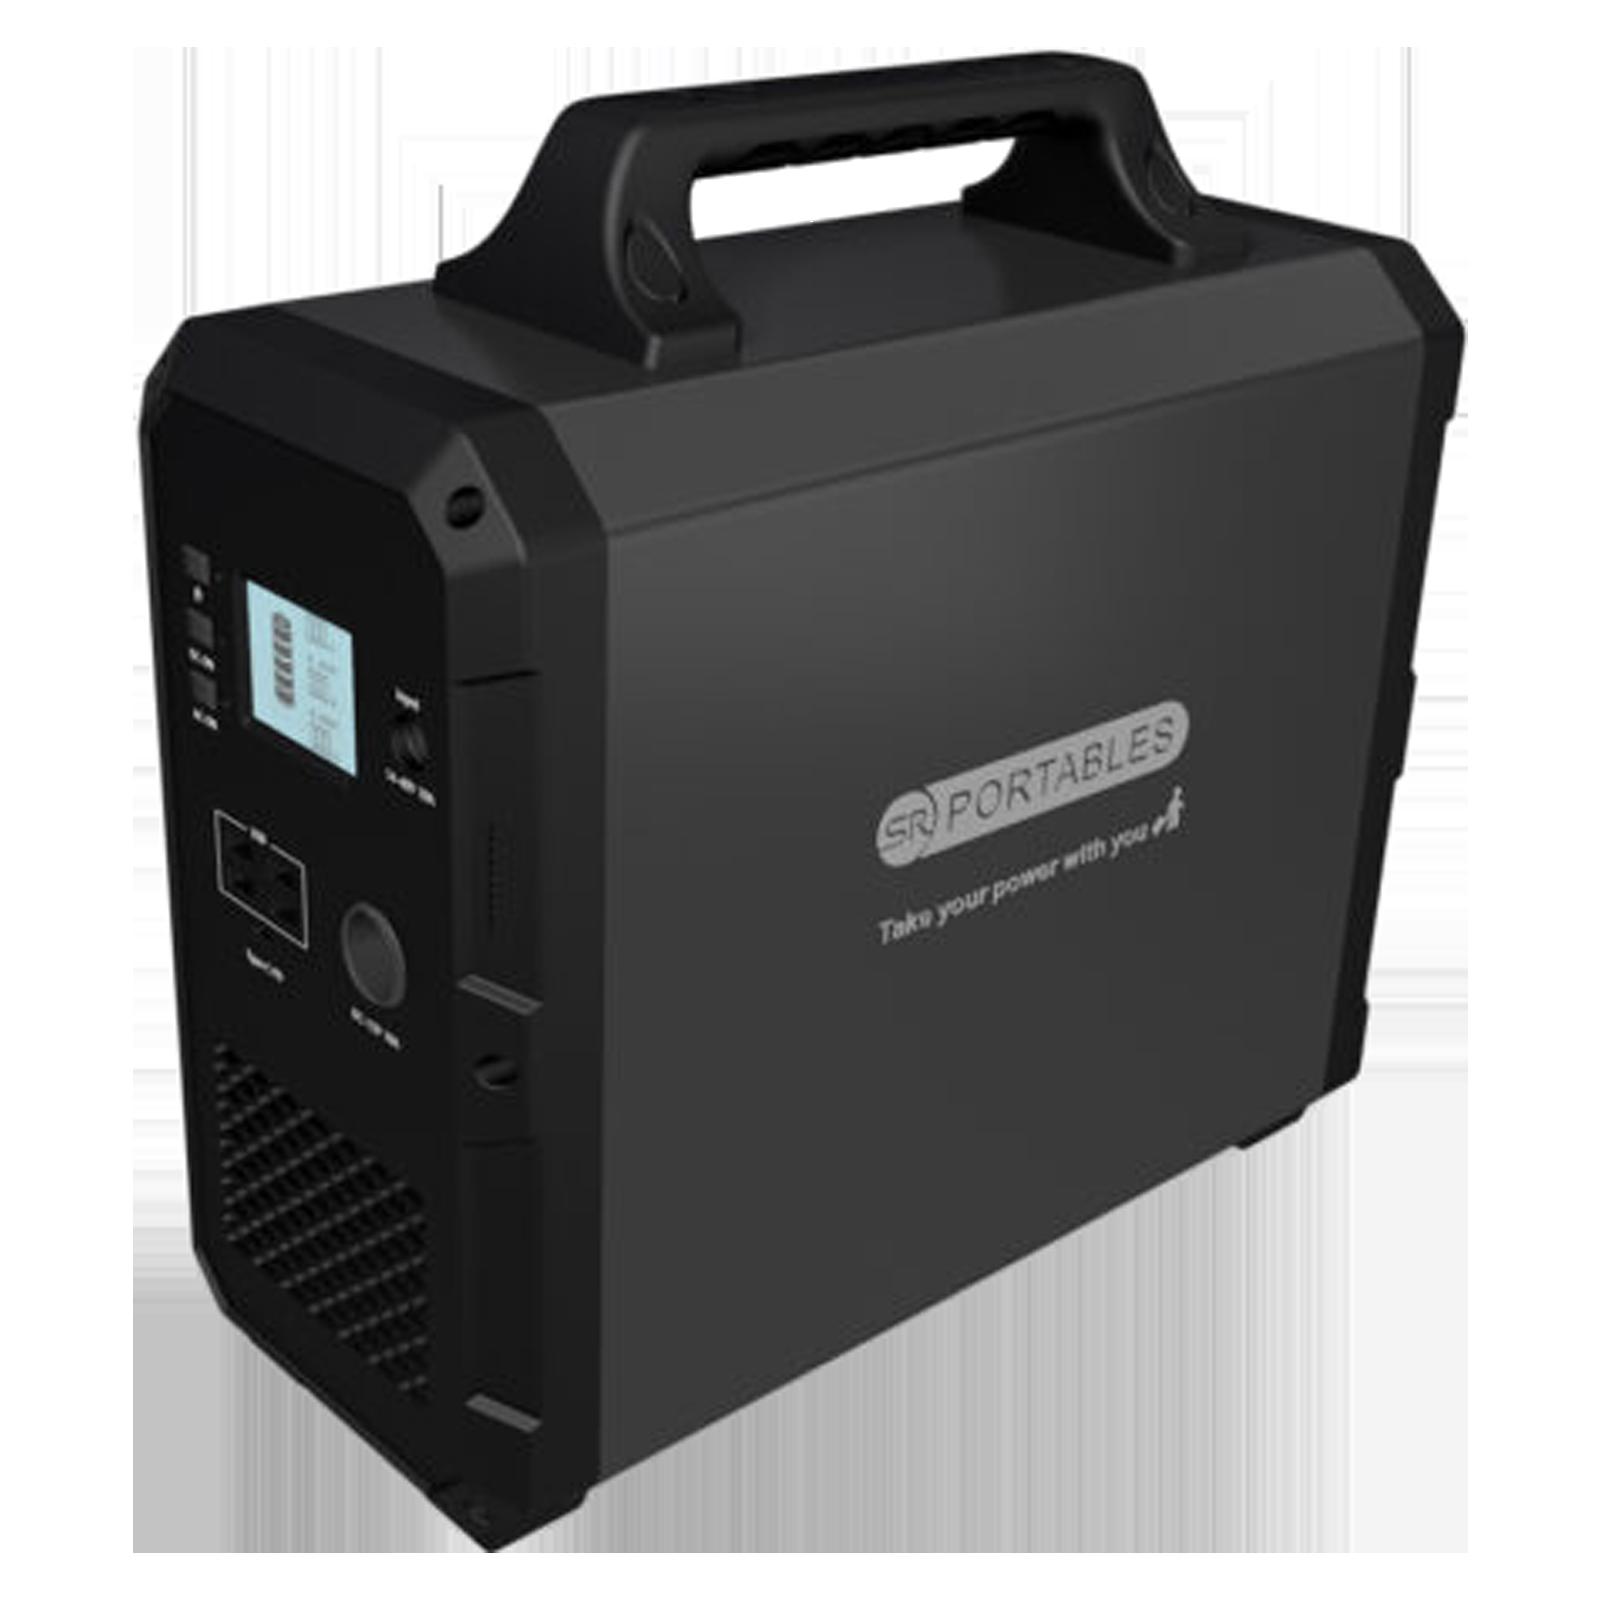 SR Portables Minotaur 1500Wh 1000 Watts Portable Solar Generator (Water Resistant, SRMINOTR, Black)_1